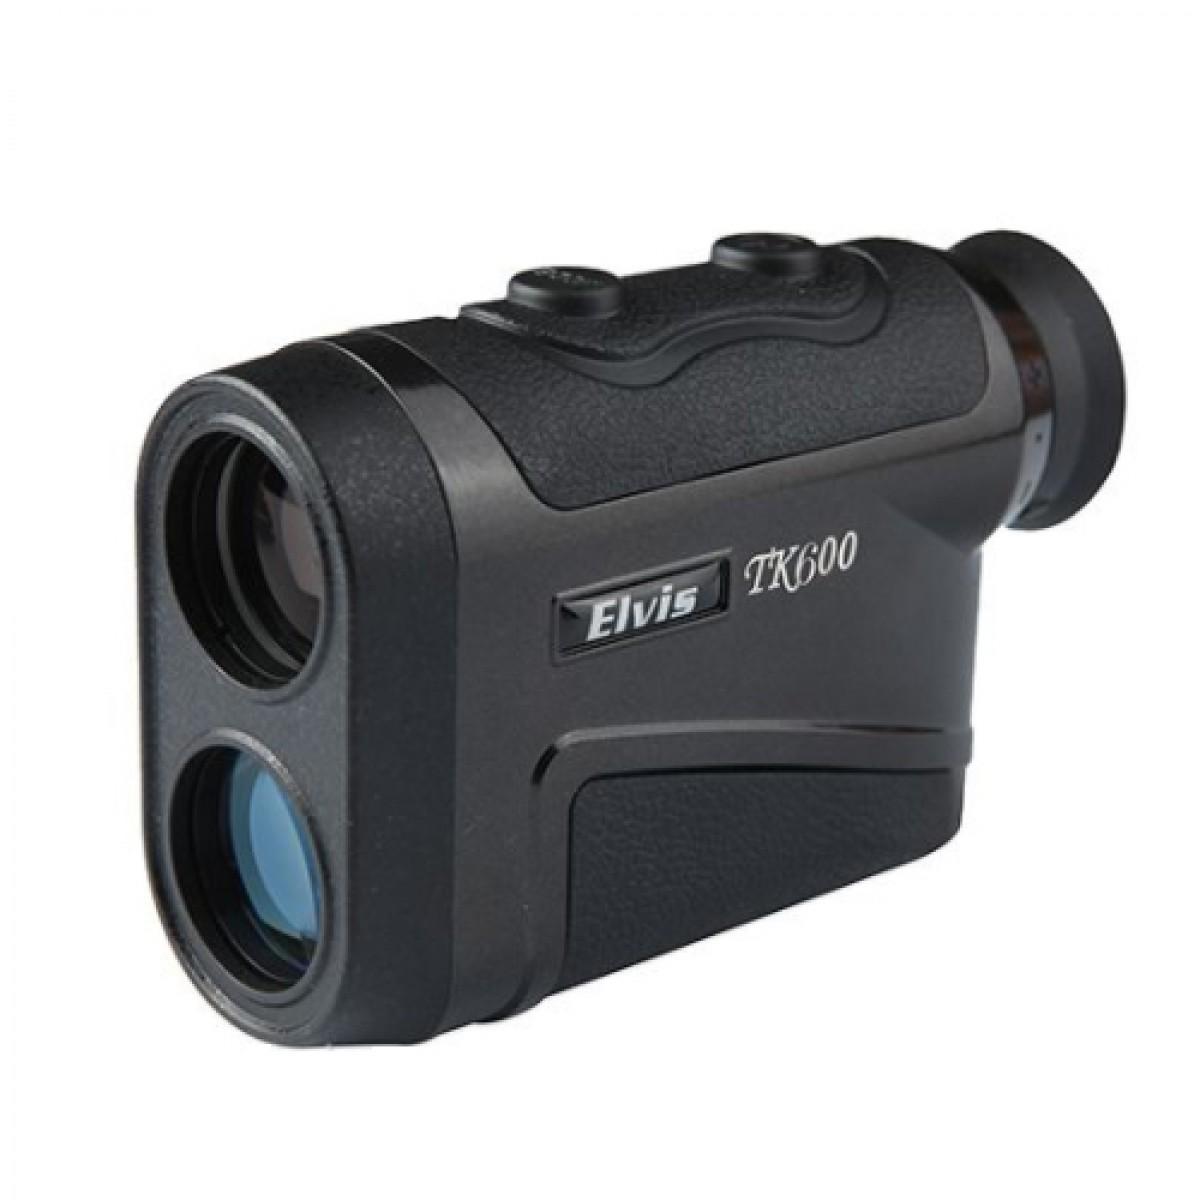 艾立仕 TK600 测高测角测距仪